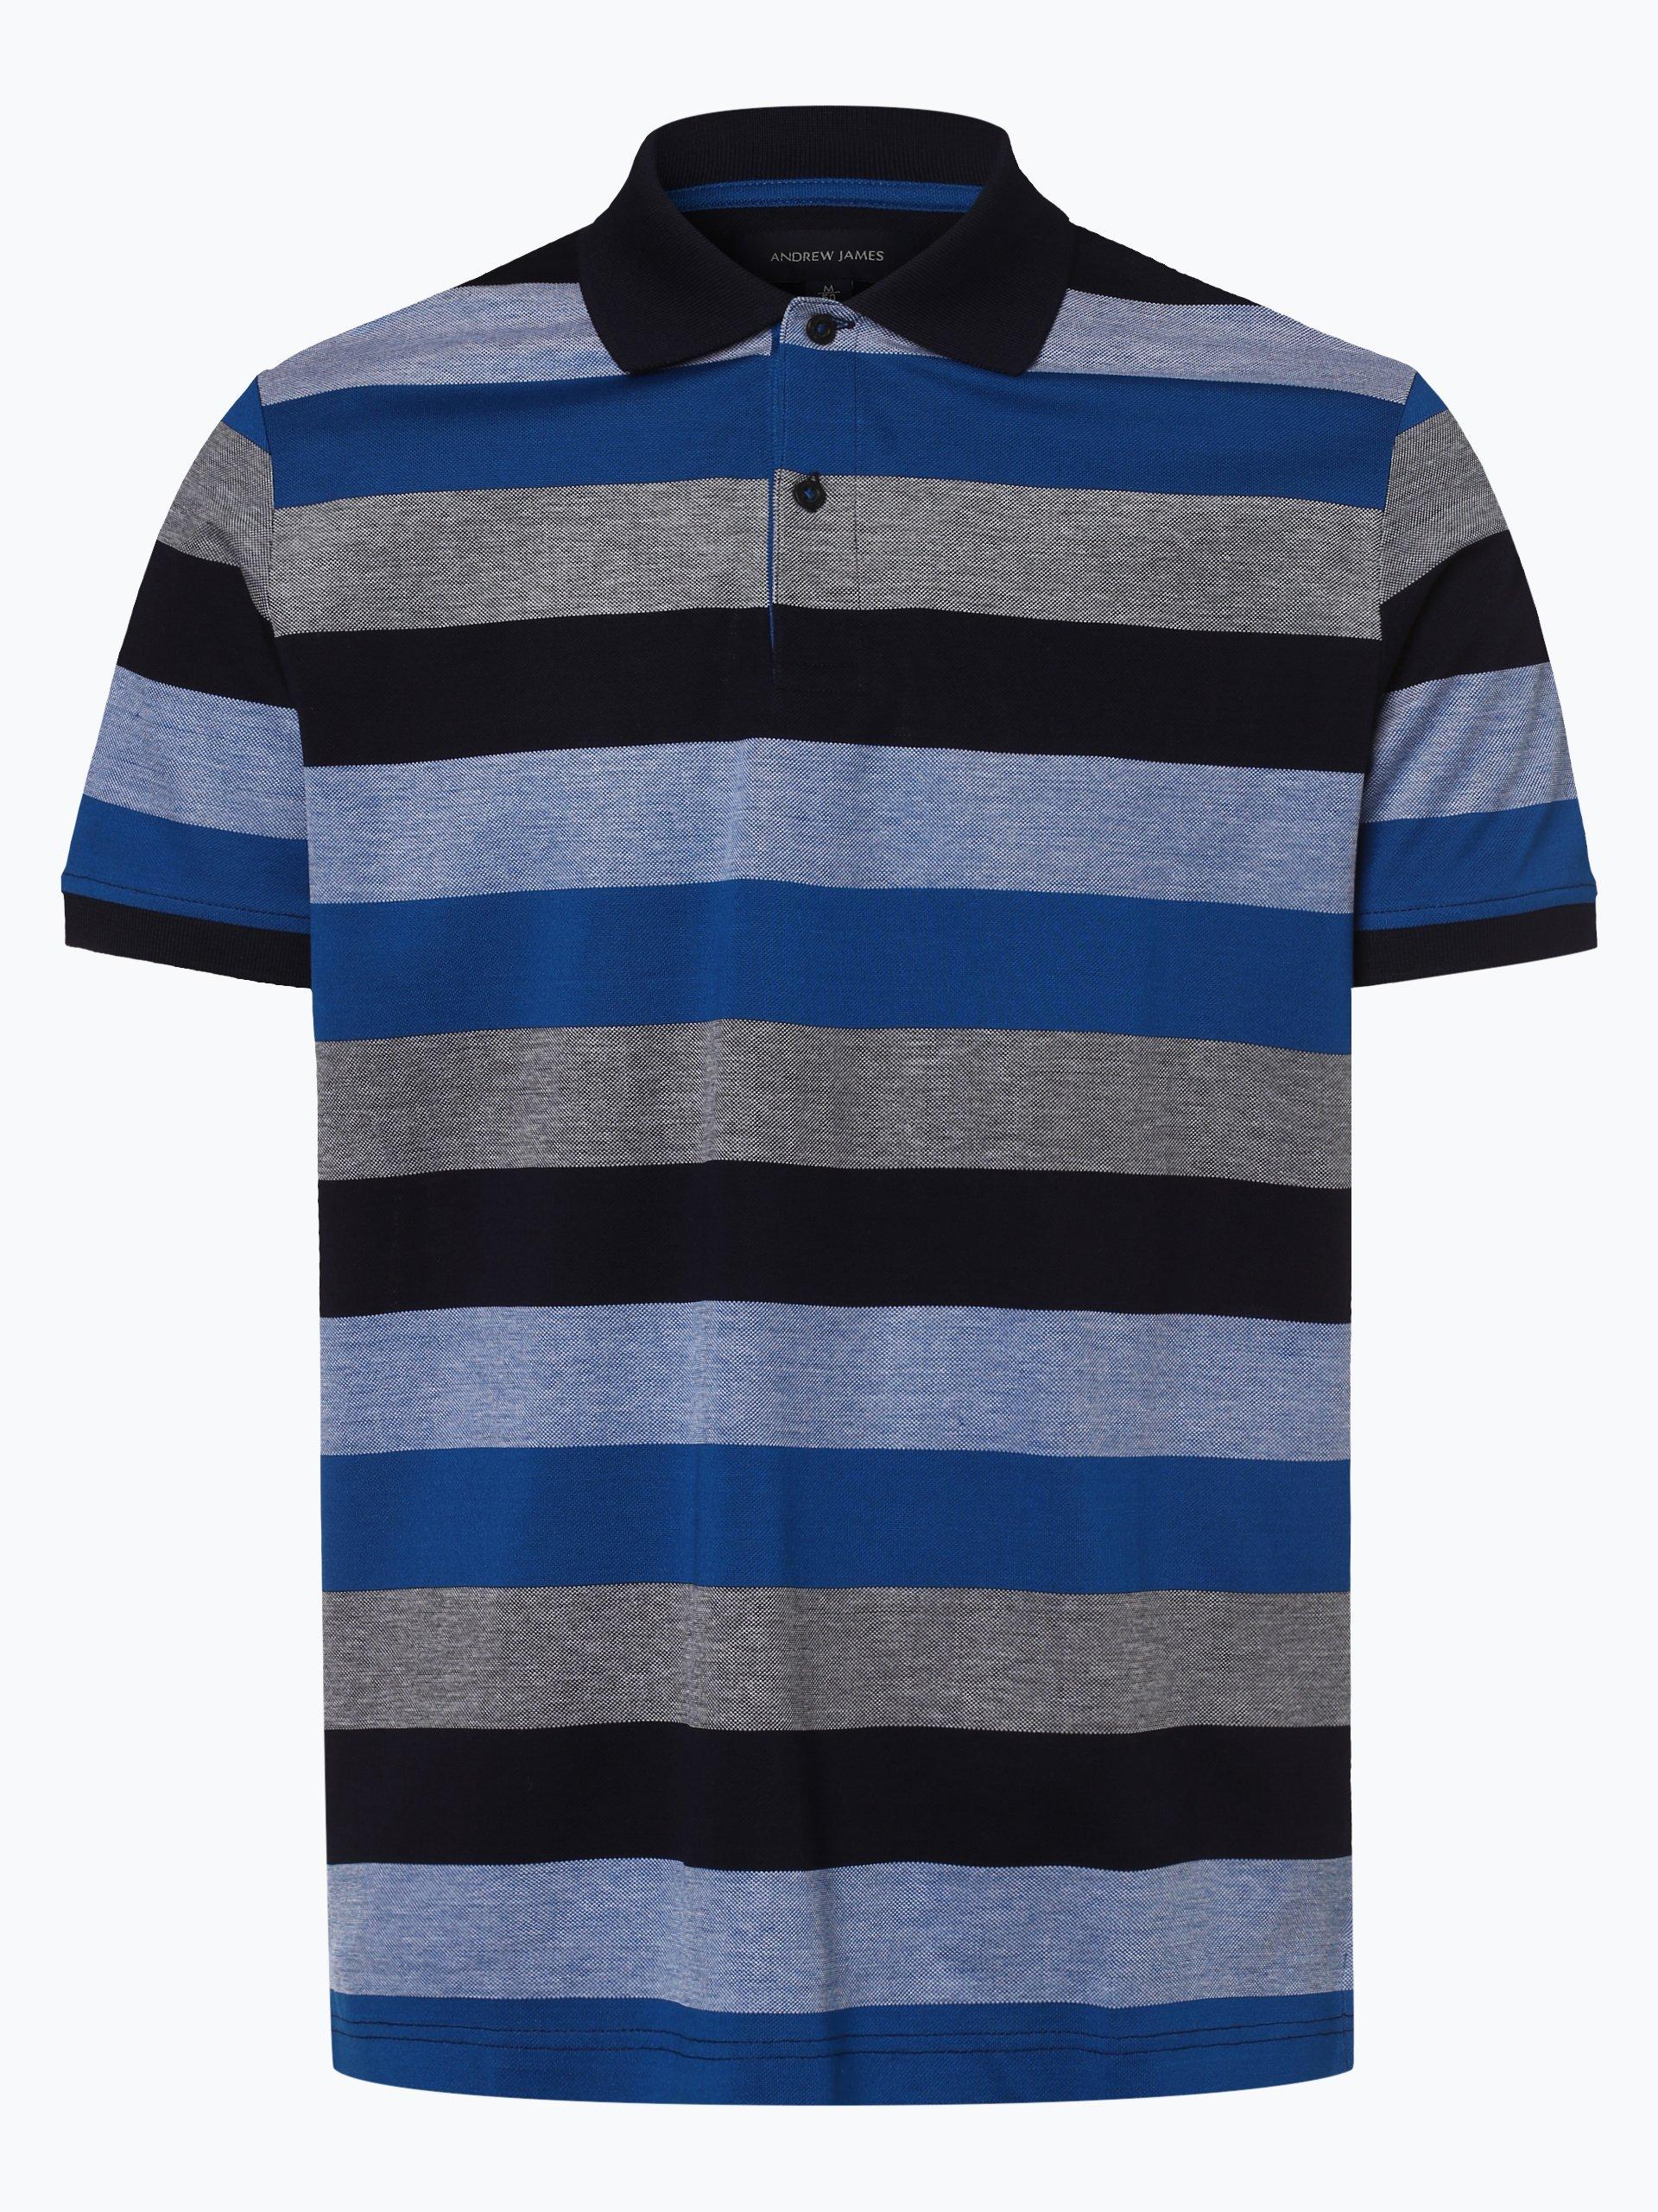 Andrew James Herren Poloshirt